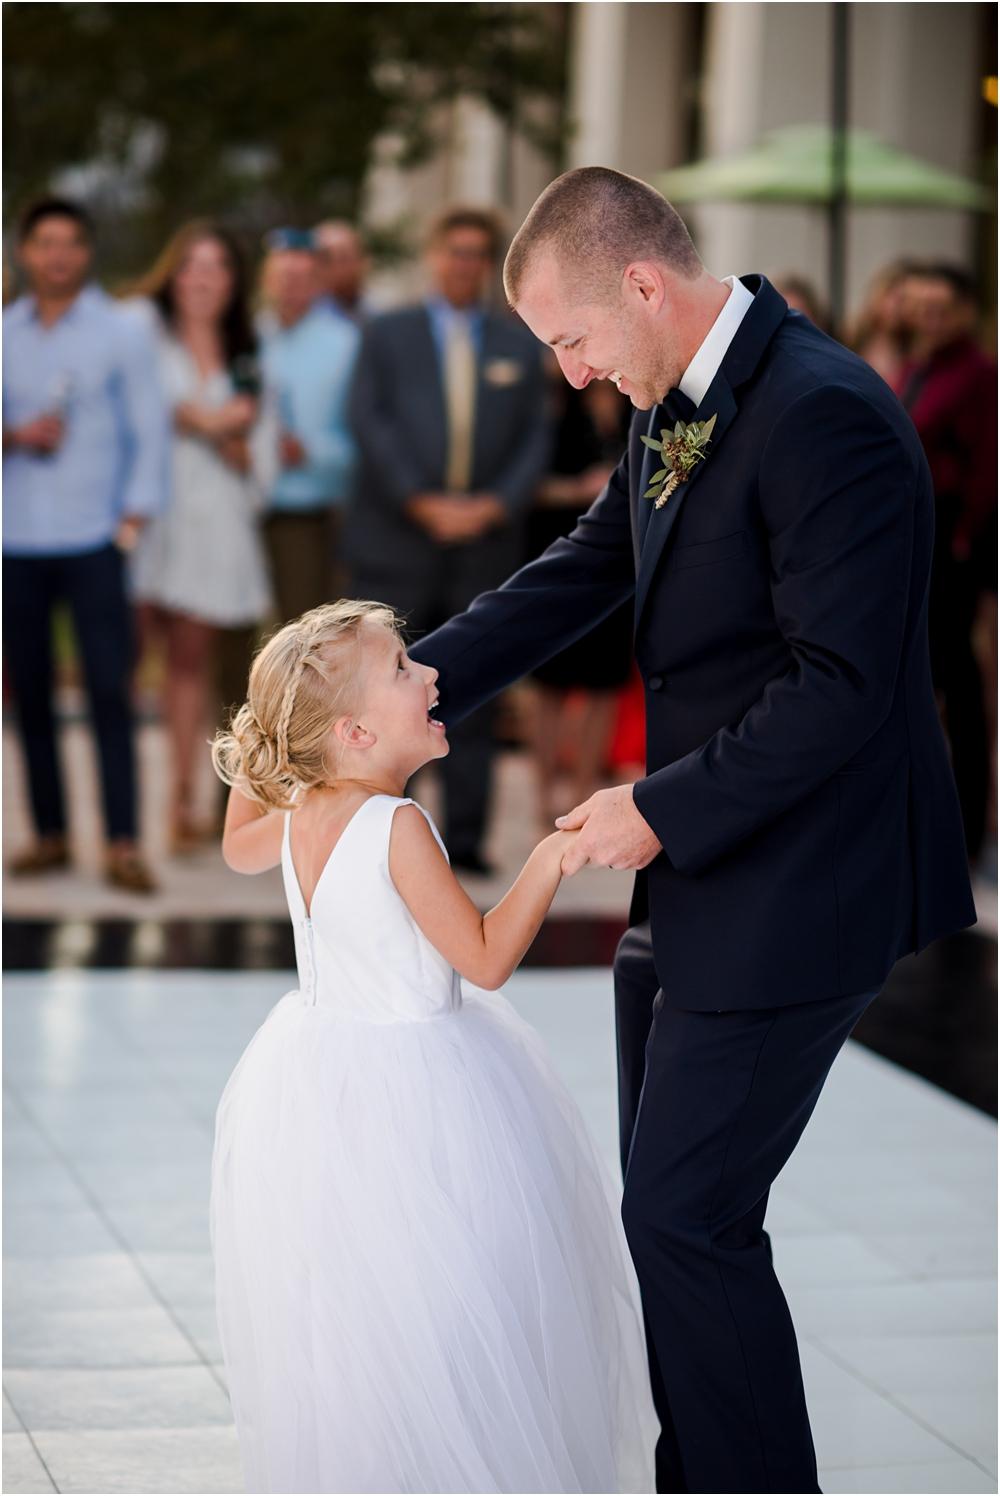 wilkins-sheraton-panama-city-beach-florida-wedding-dothan-tallahassee-kiersten-stevenson-photography-162.jpg